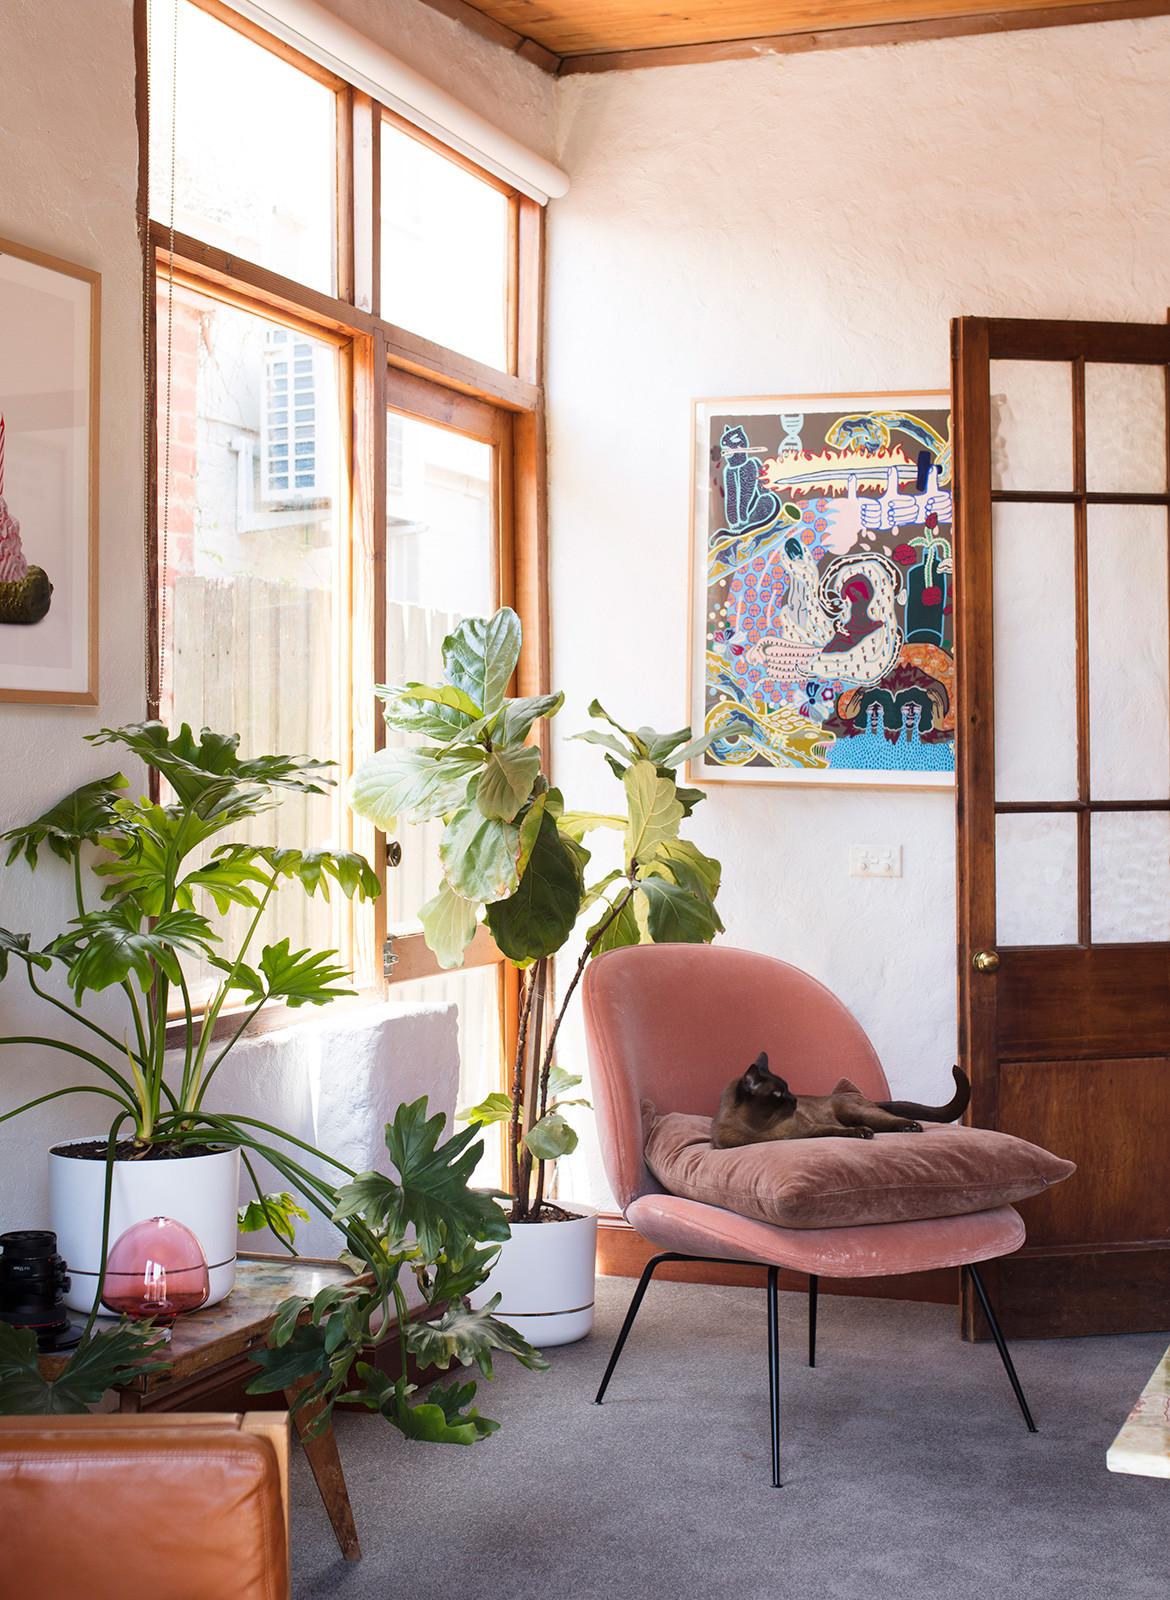 Anna Ross Kester Black CC Benjamin Hosking living room details